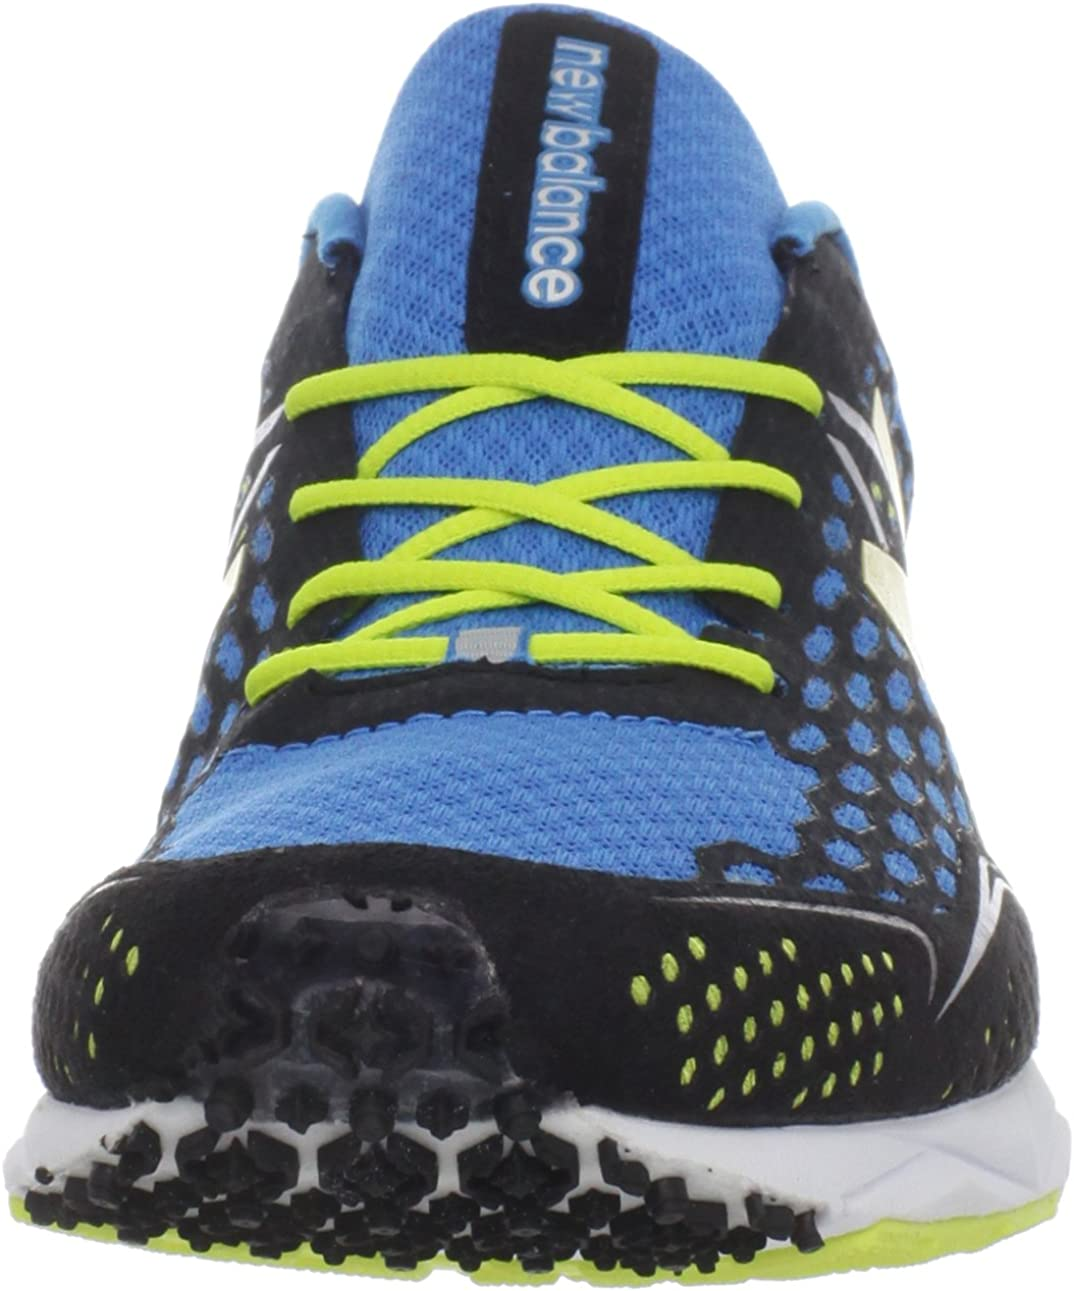 New Balance Men's MRC1600 Competition-M Running Shoe